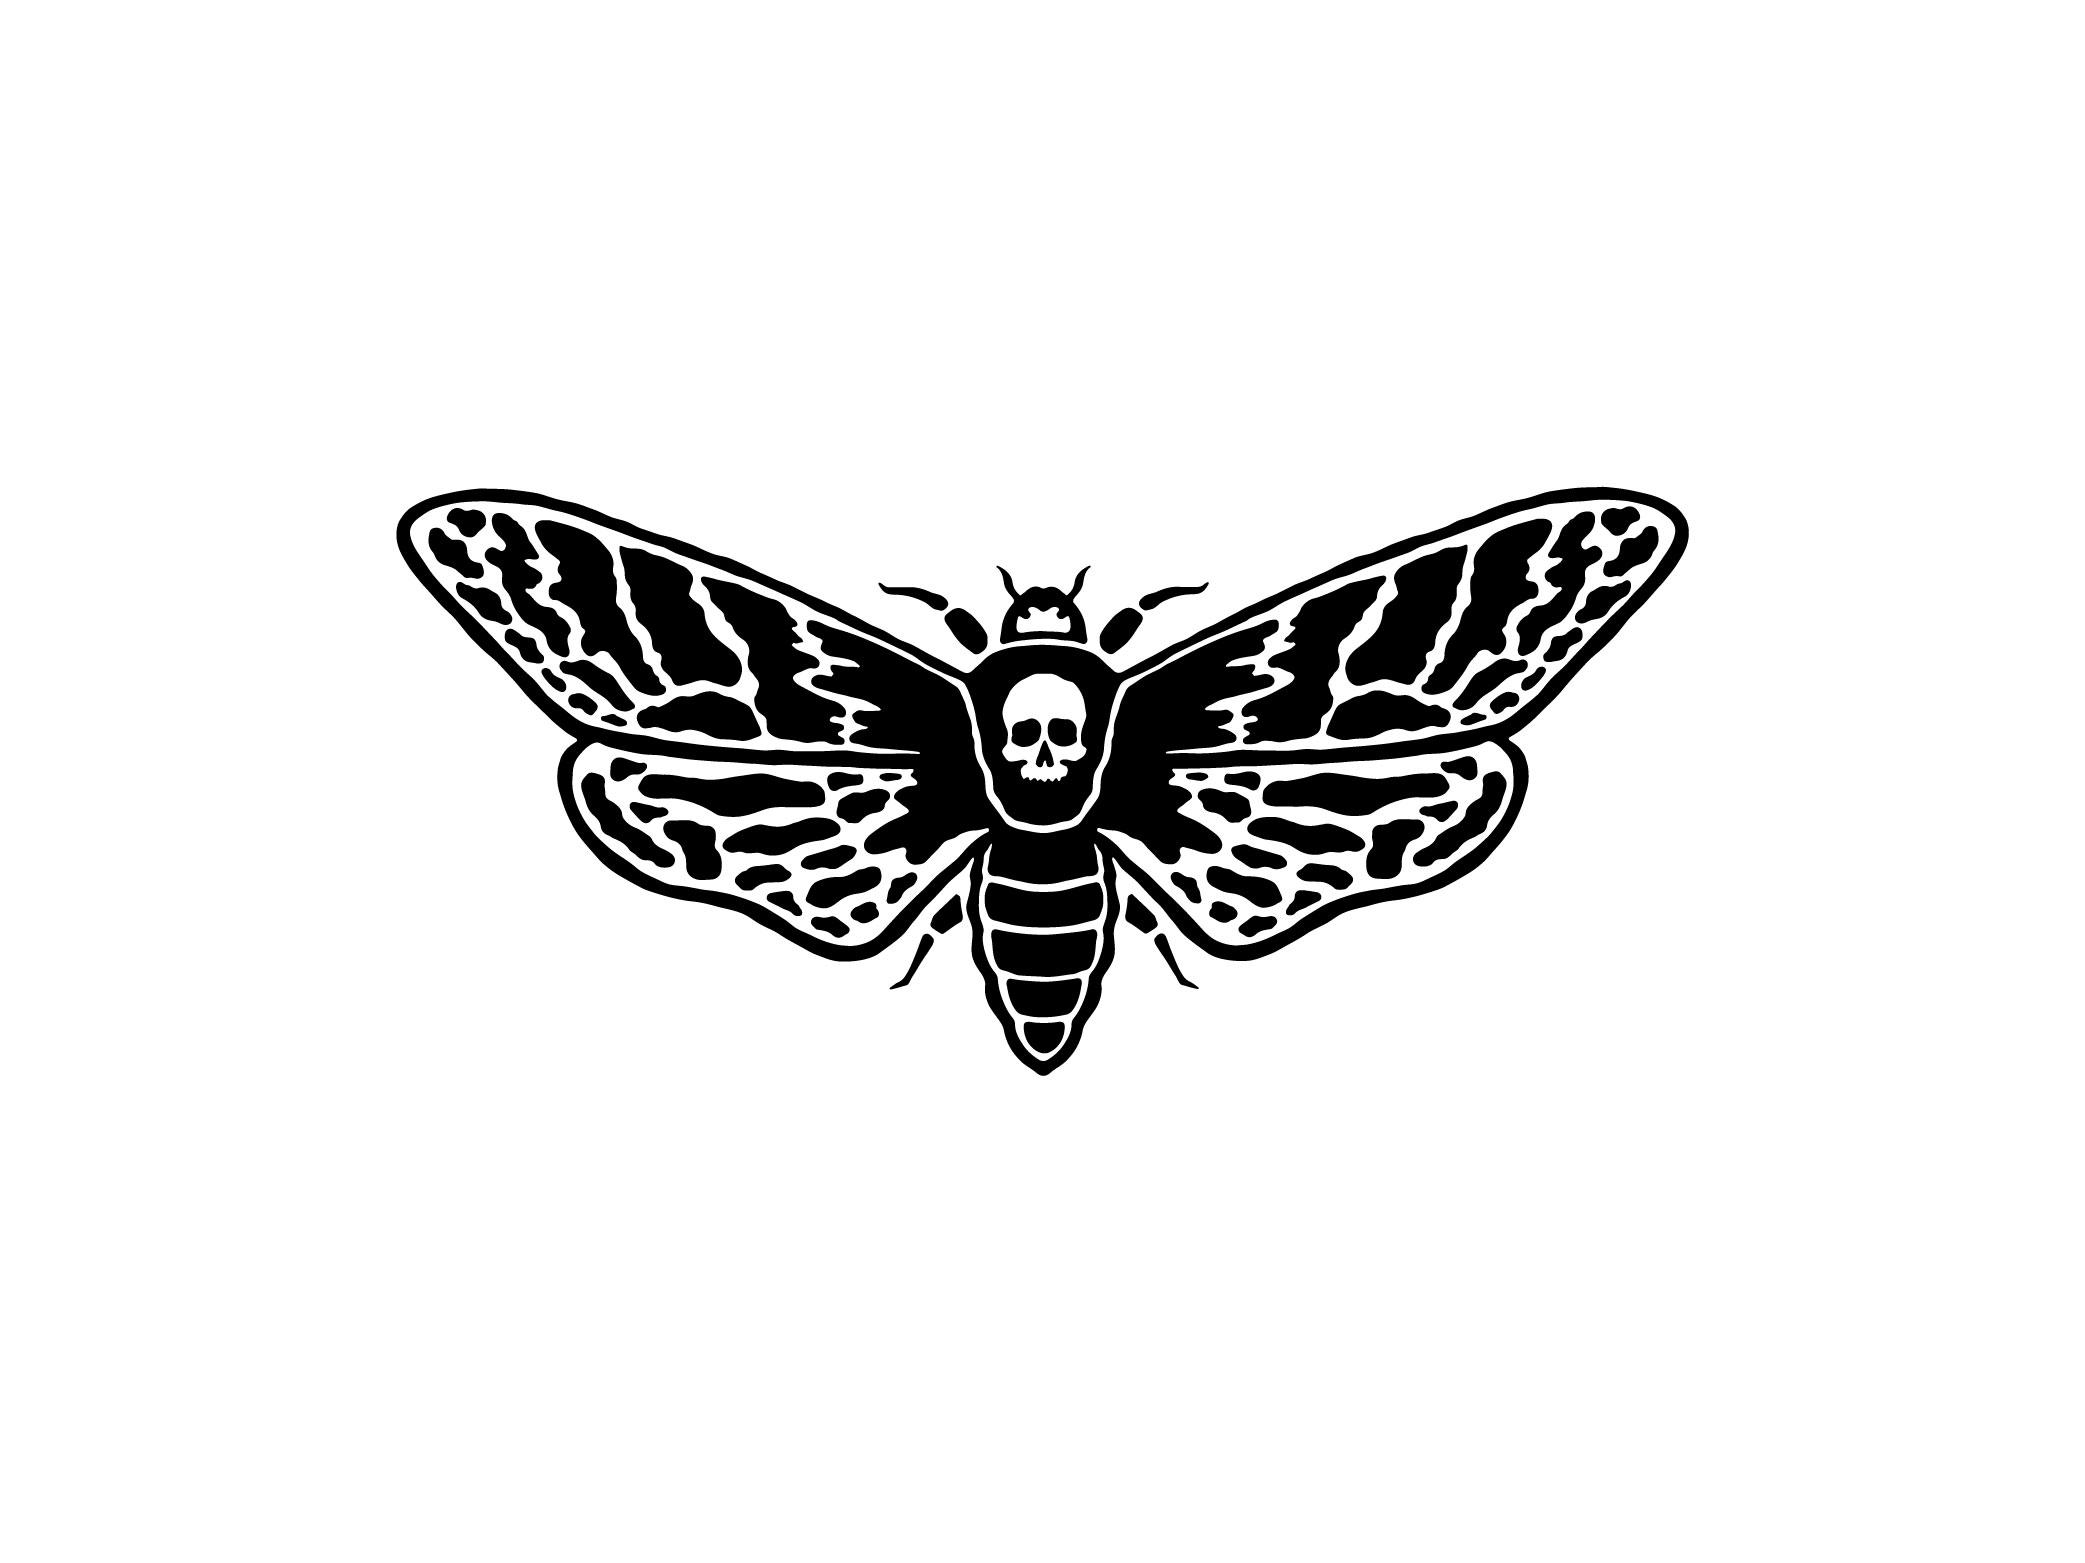 Studio Freight - Skull Moth Illustration